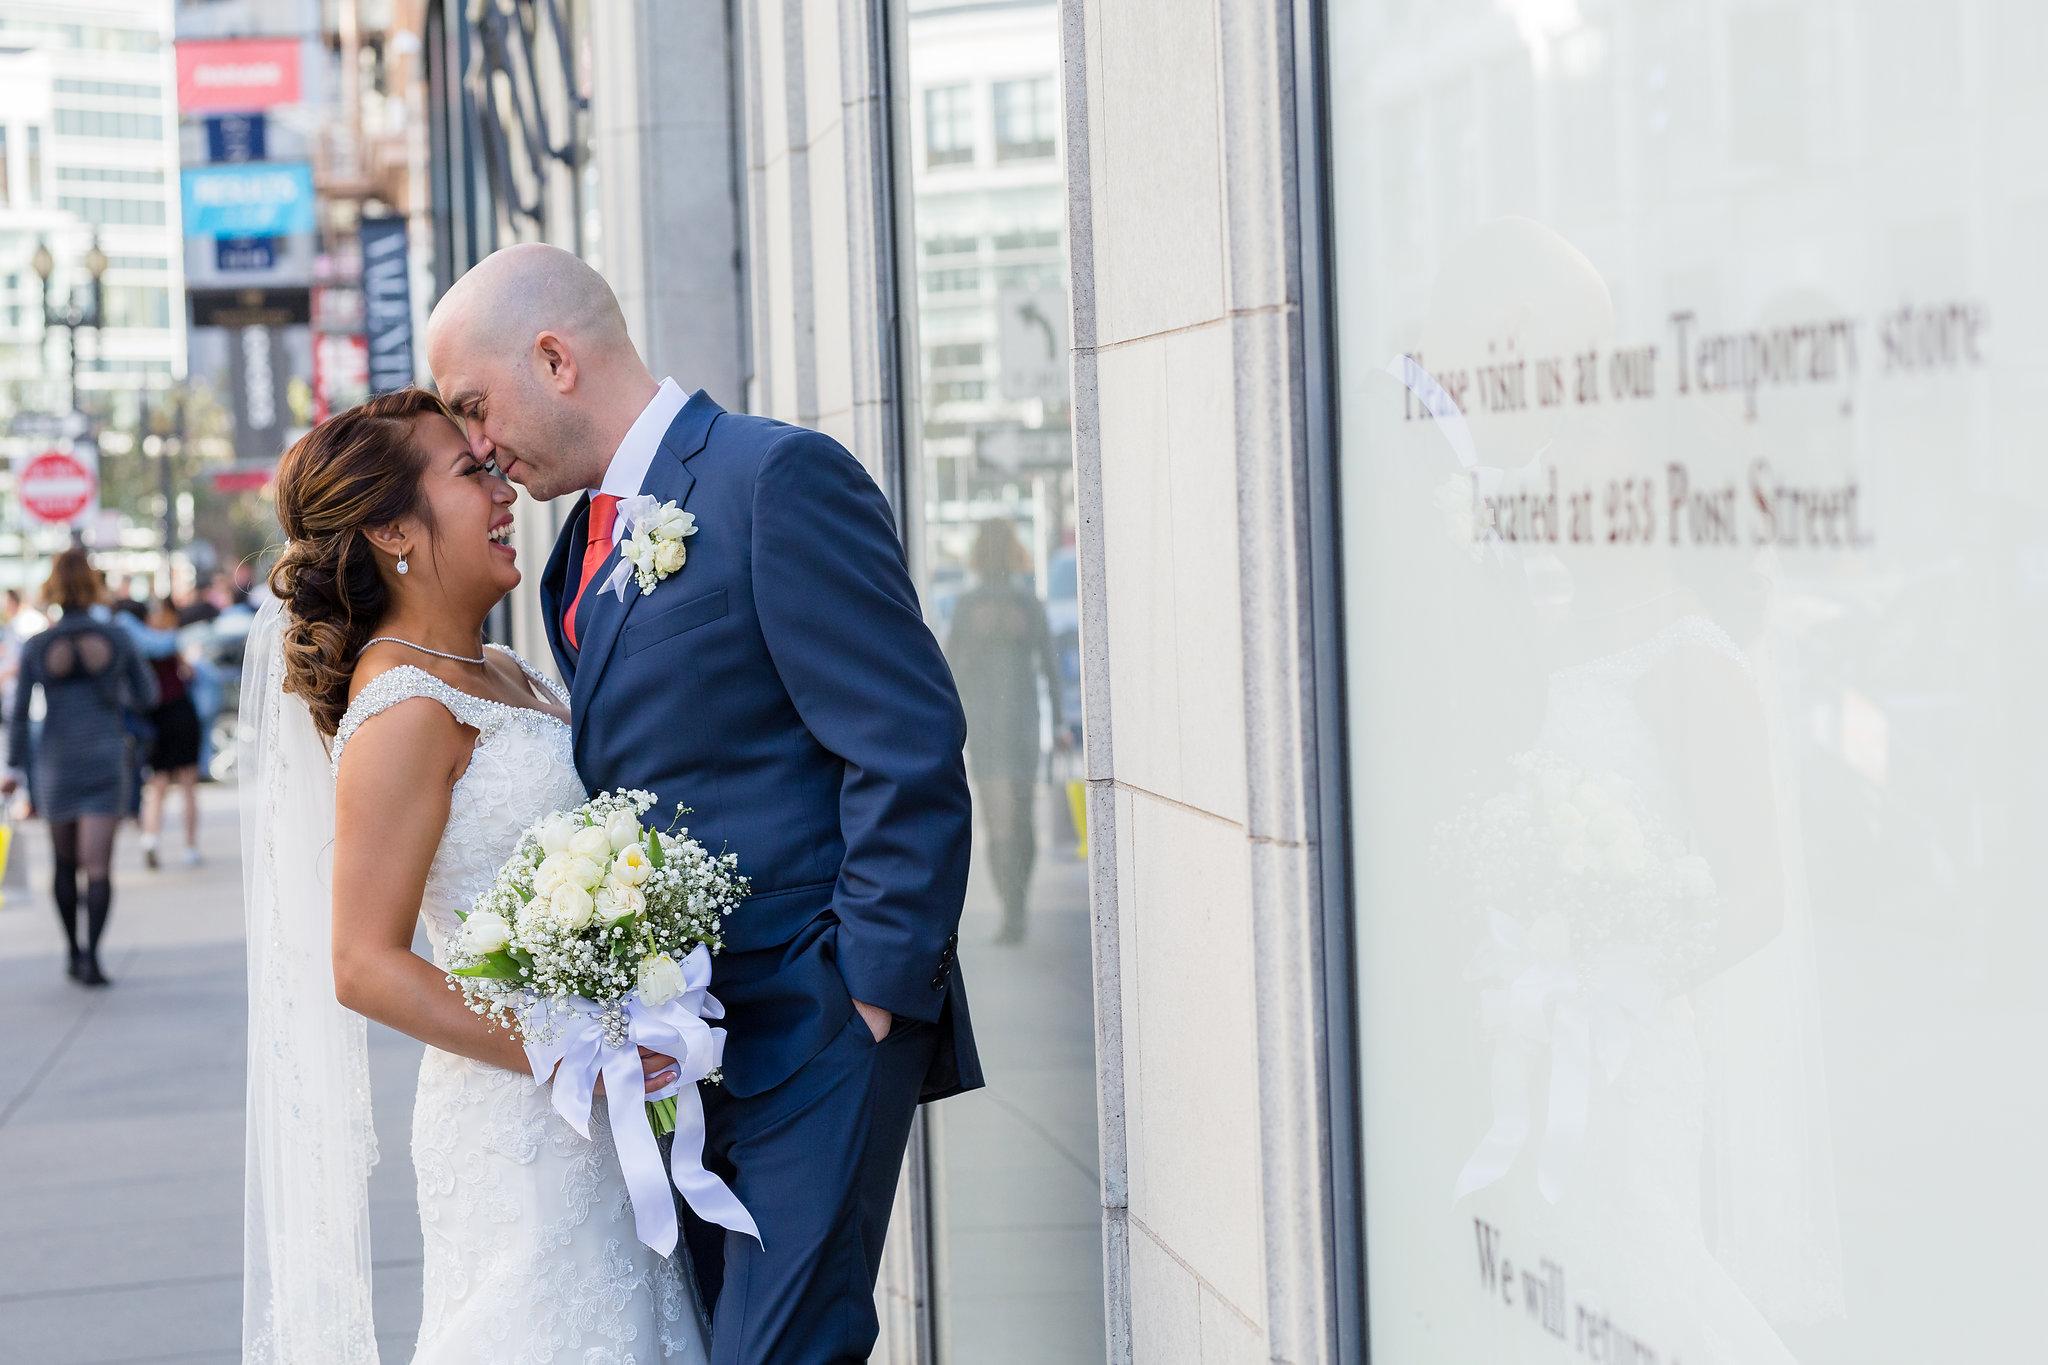 union square wedding photography-13.jpg